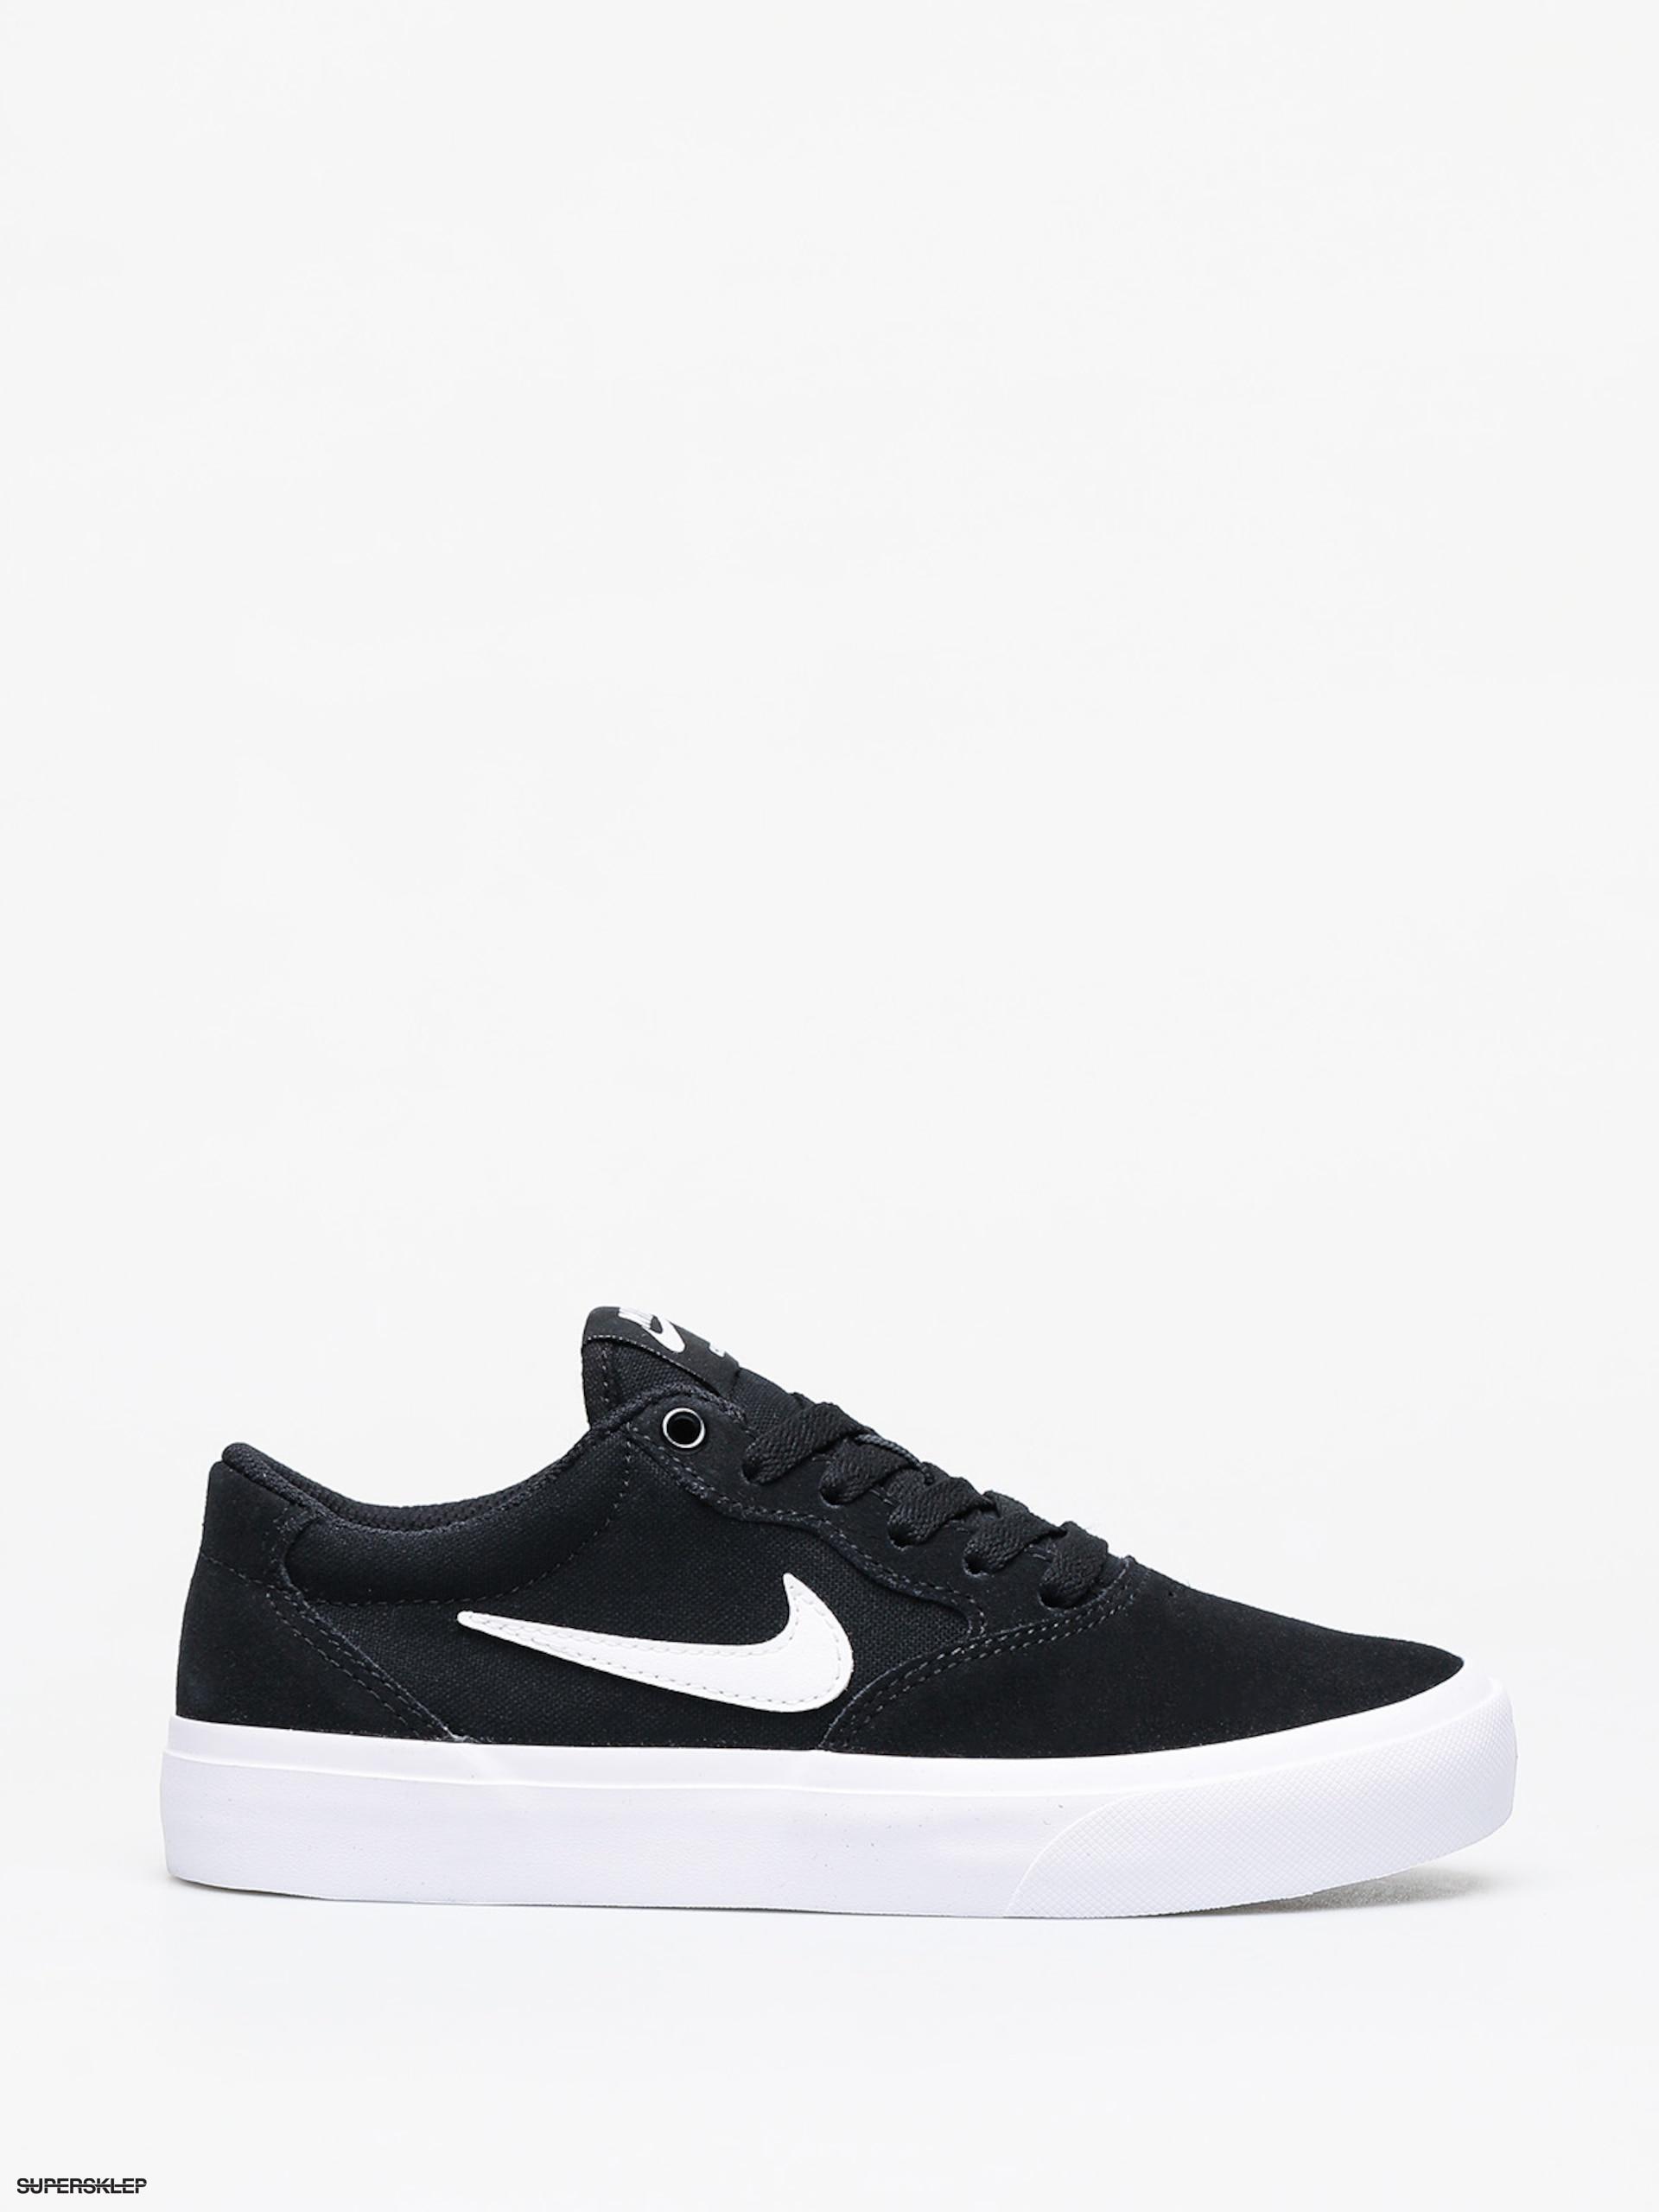 Buty Nike SB Chron (blackwhite)